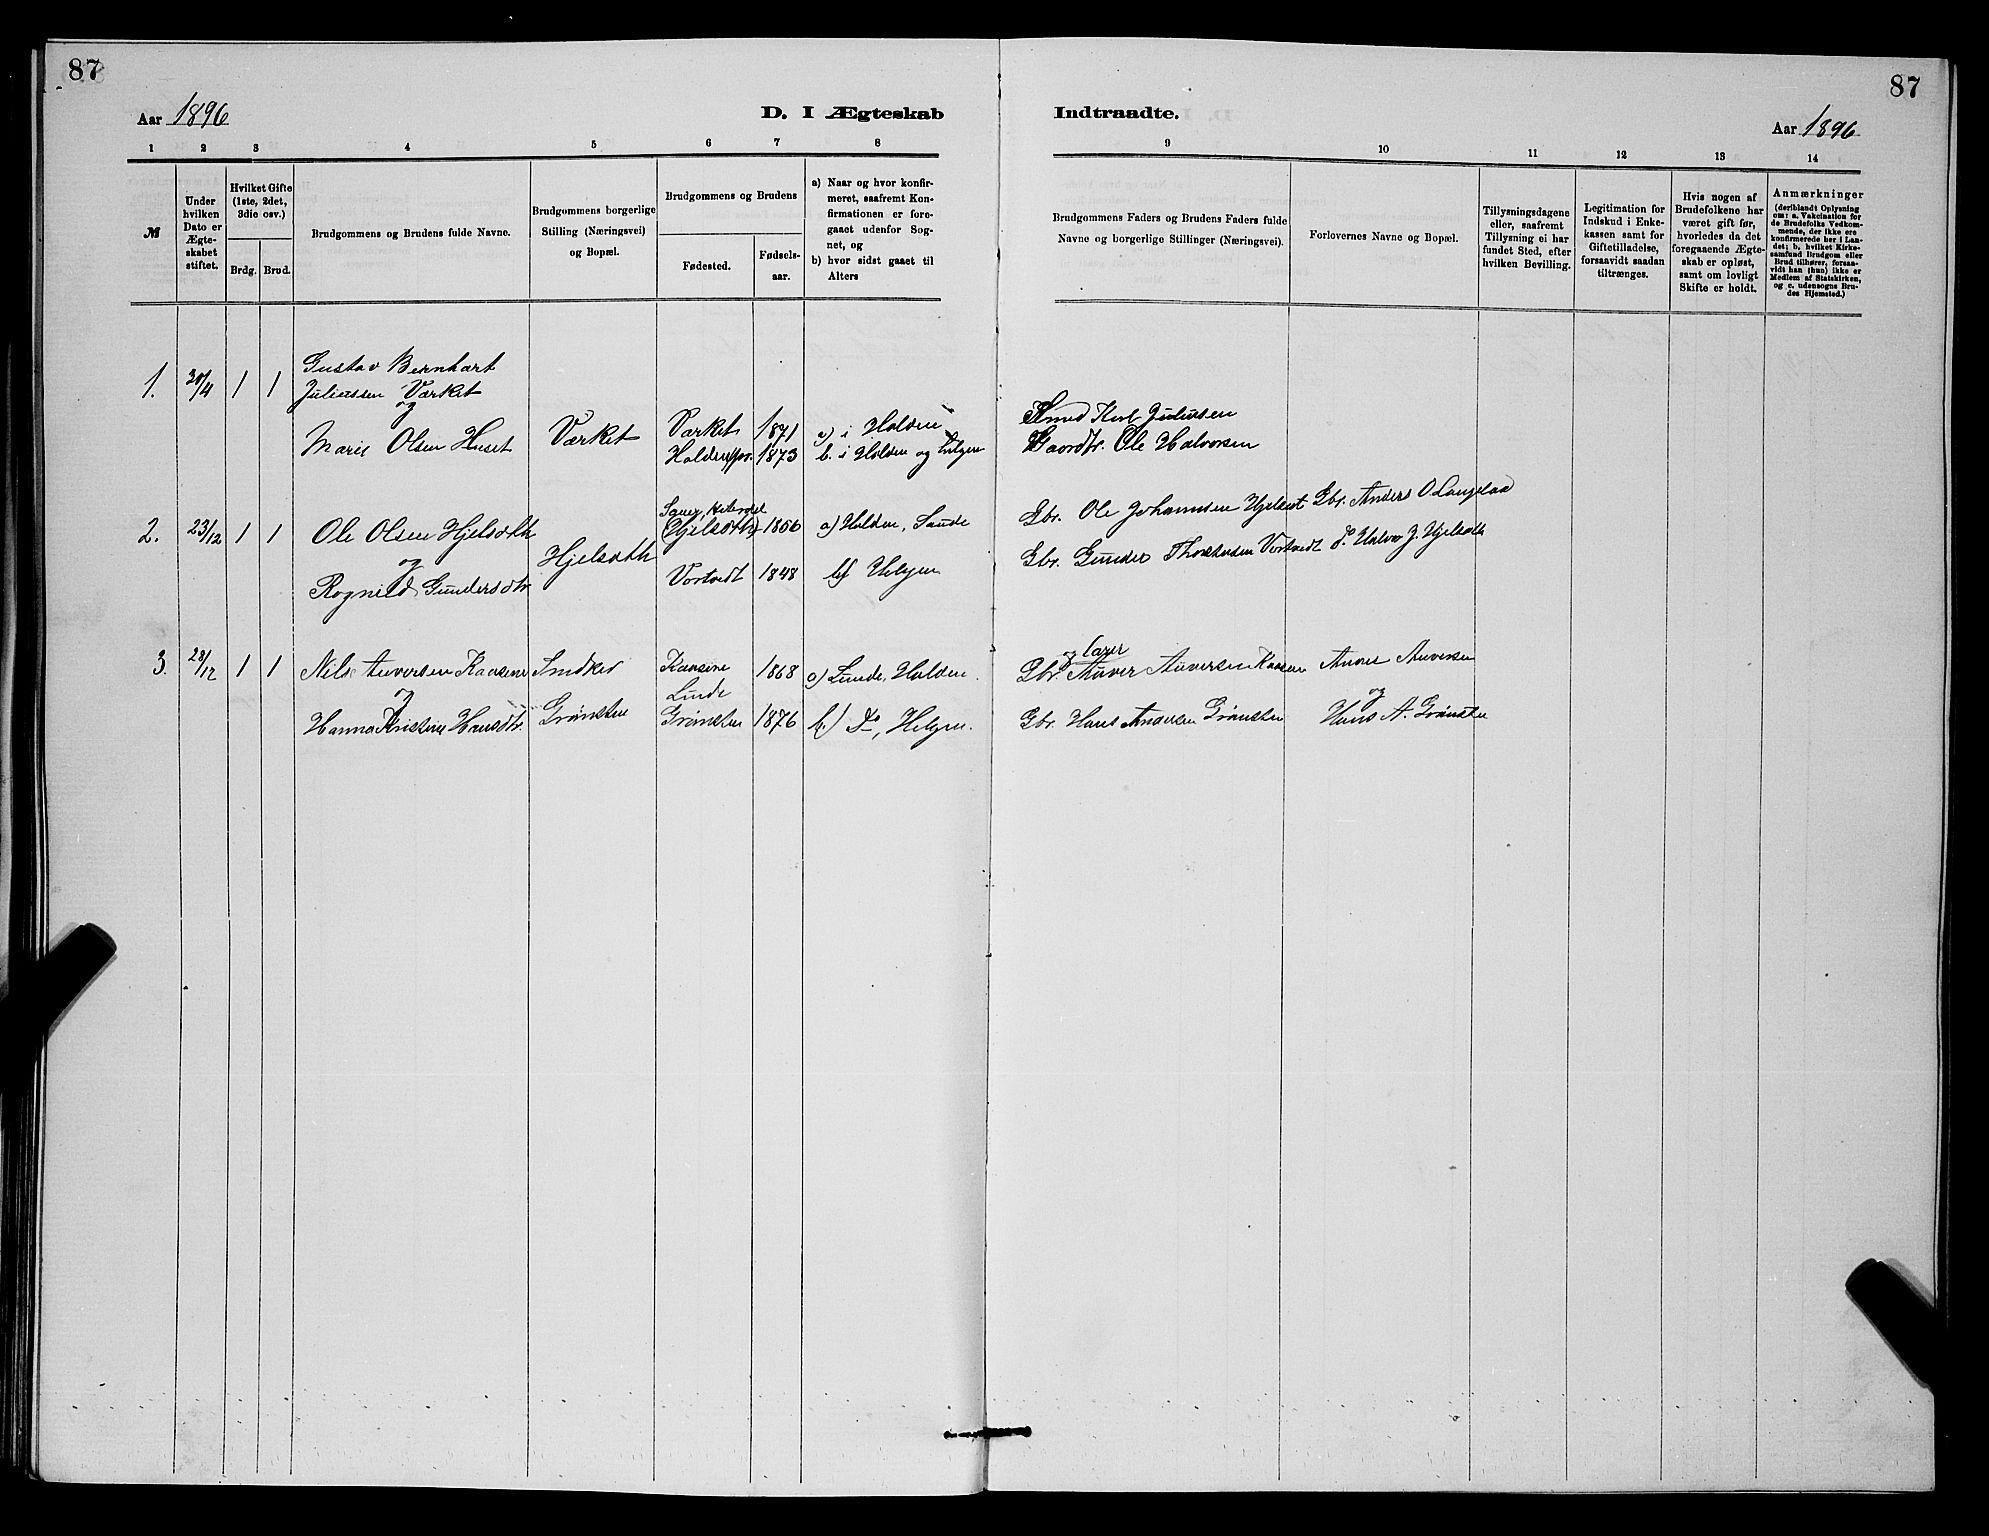 SAKO, Holla kirkebøker, G/Gb/L0001: Klokkerbok nr. II 1, 1882-1897, s. 87